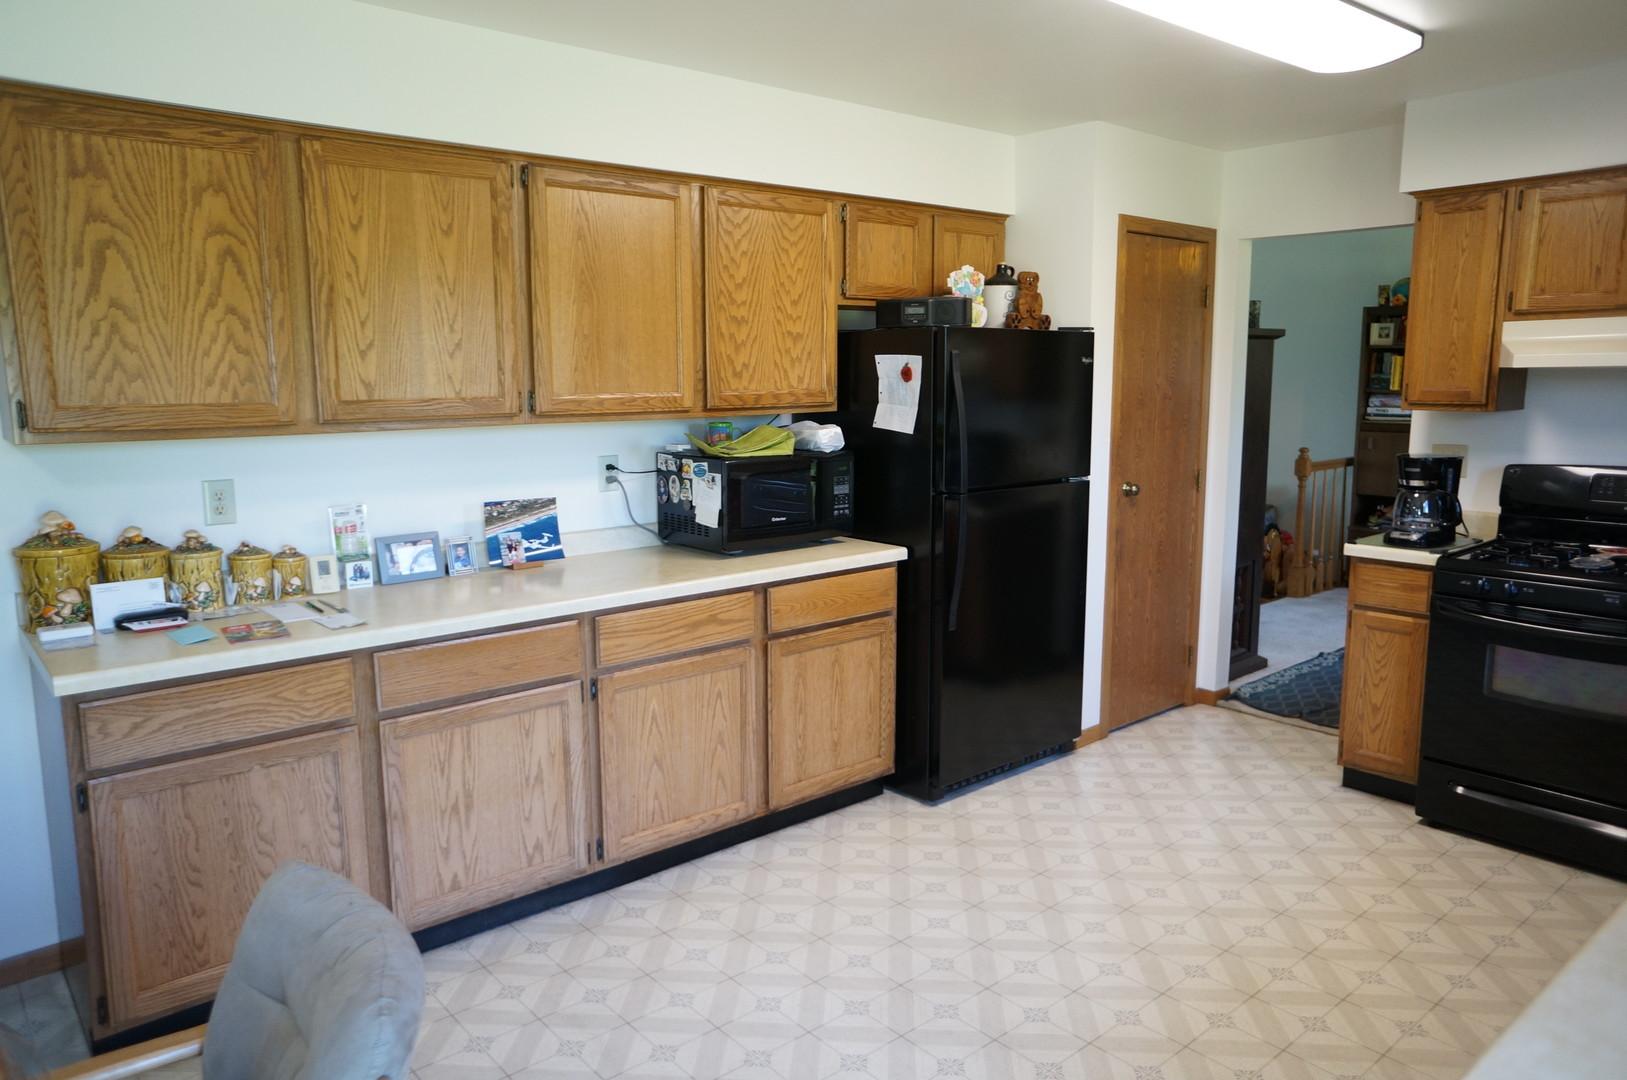 24364 South Harvest Hills, FRANKFORT, Illinois, 60423